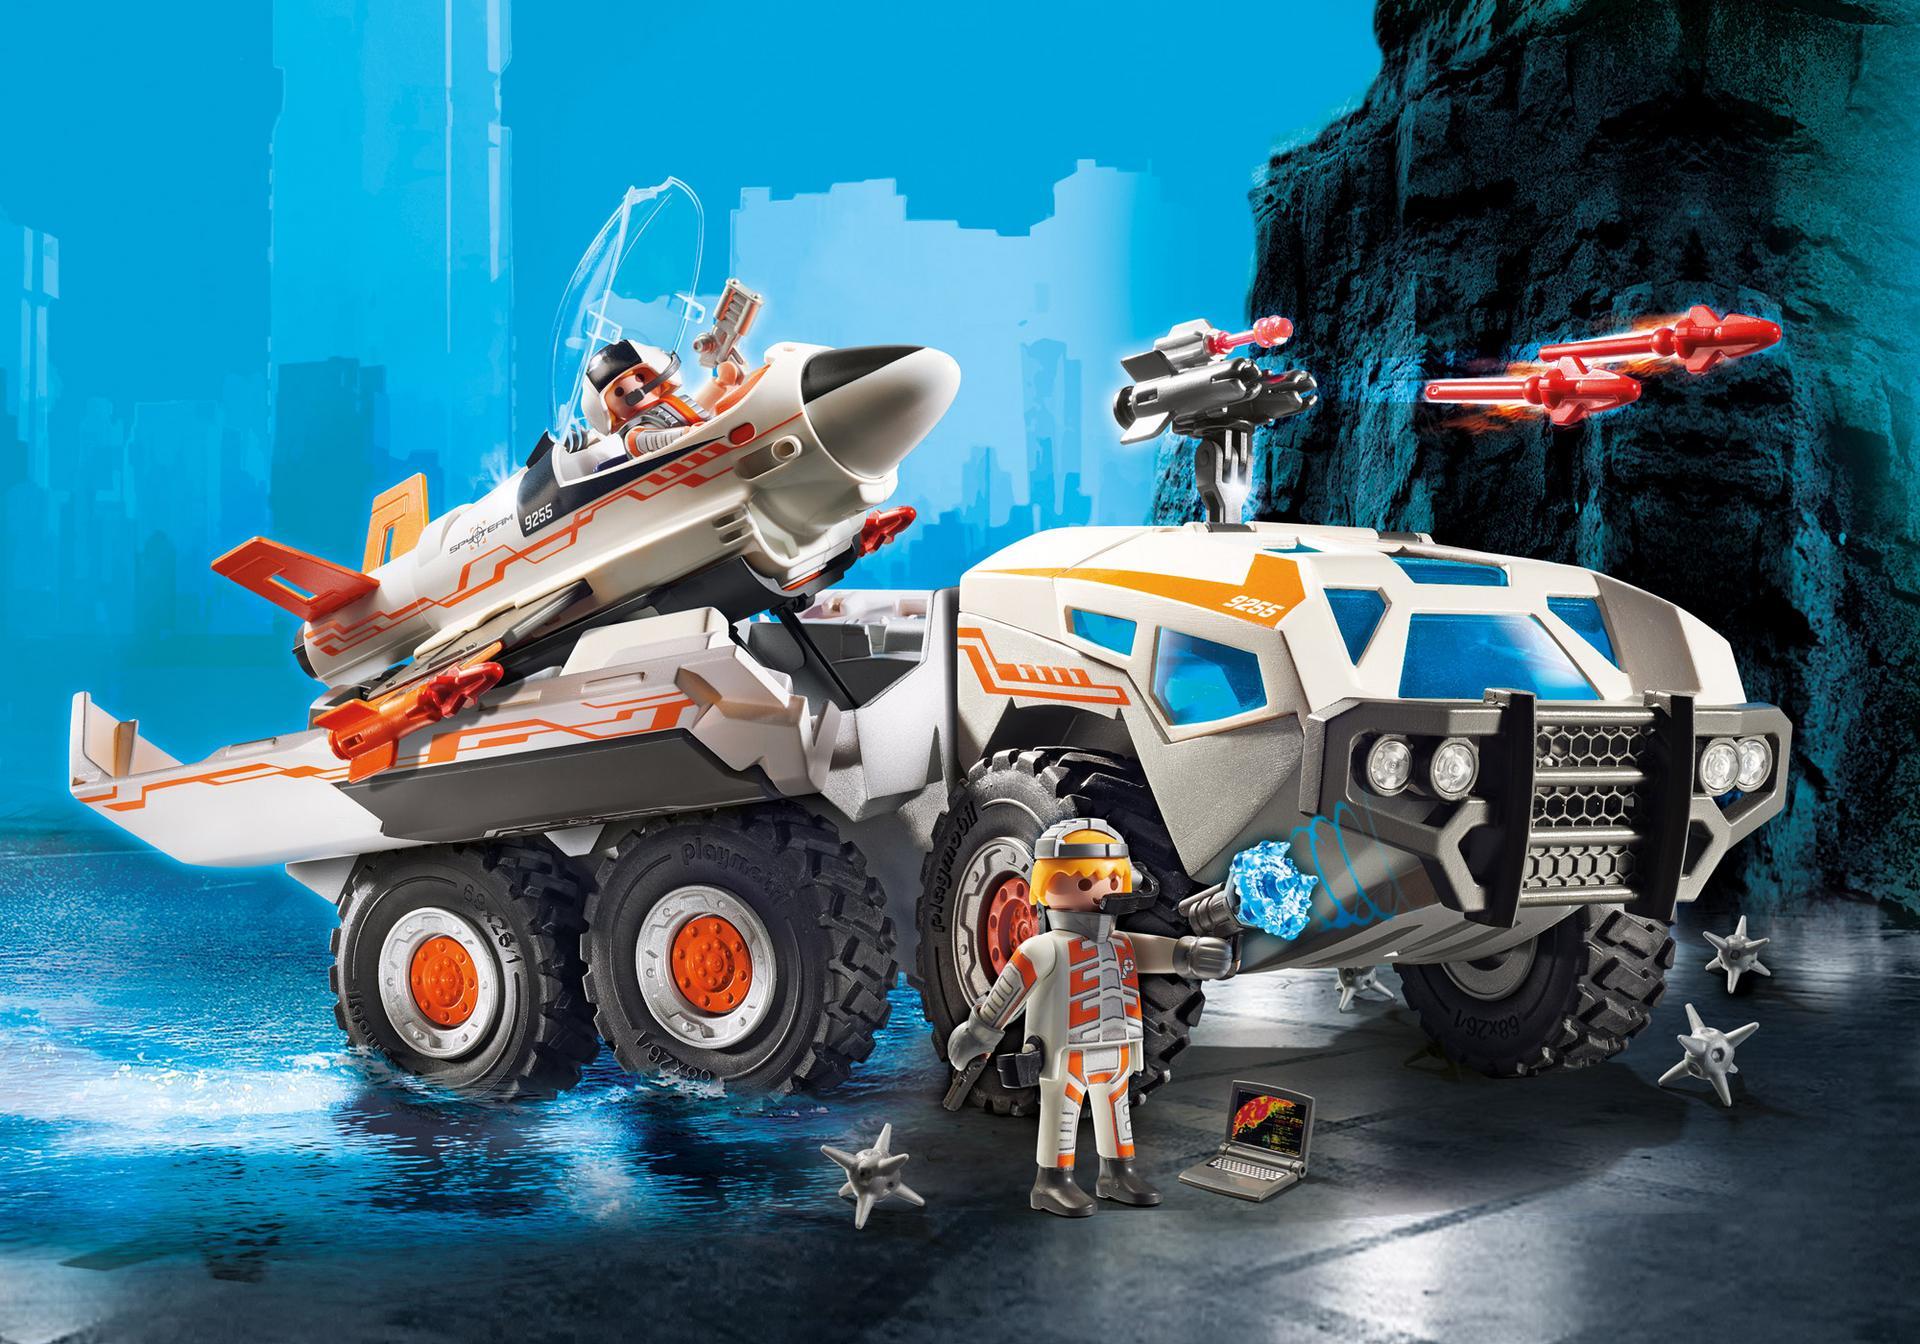 Spy Team Gevechtstruck 9255 Playmobil 174 Nederland